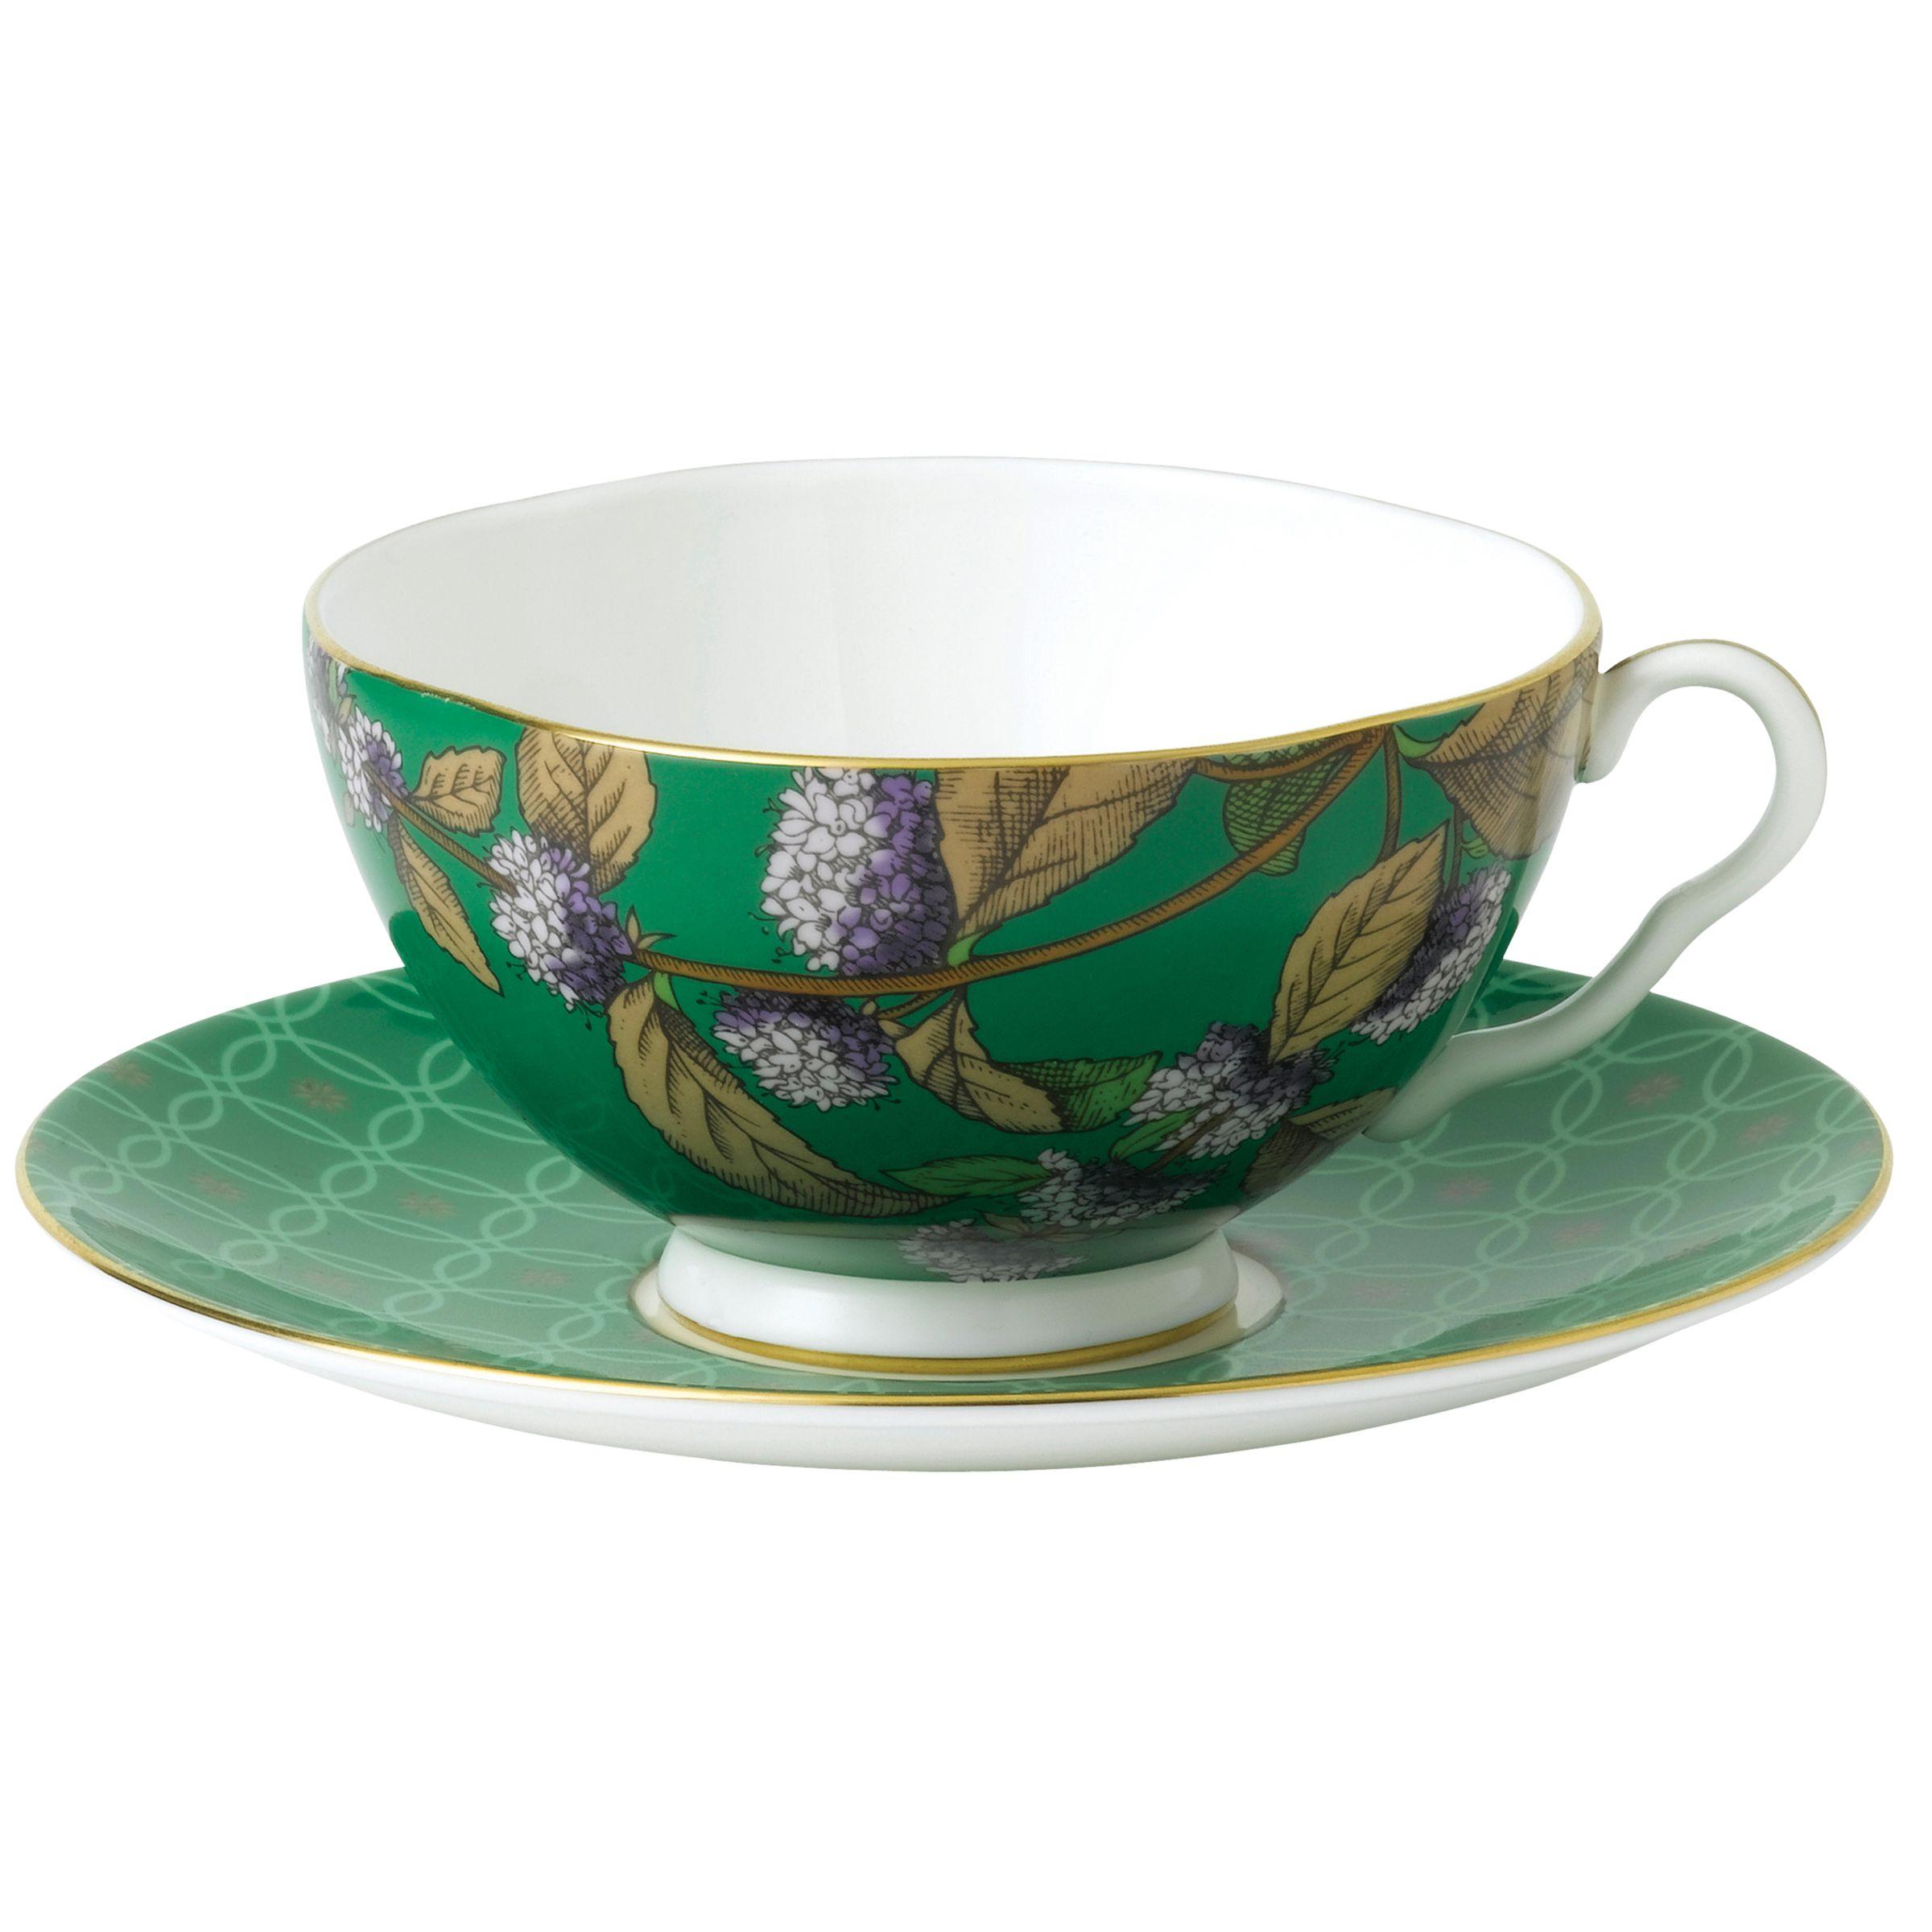 Wedgwood Wedgwood Tea Garden Green Tea & Mint Teacup & Saucer